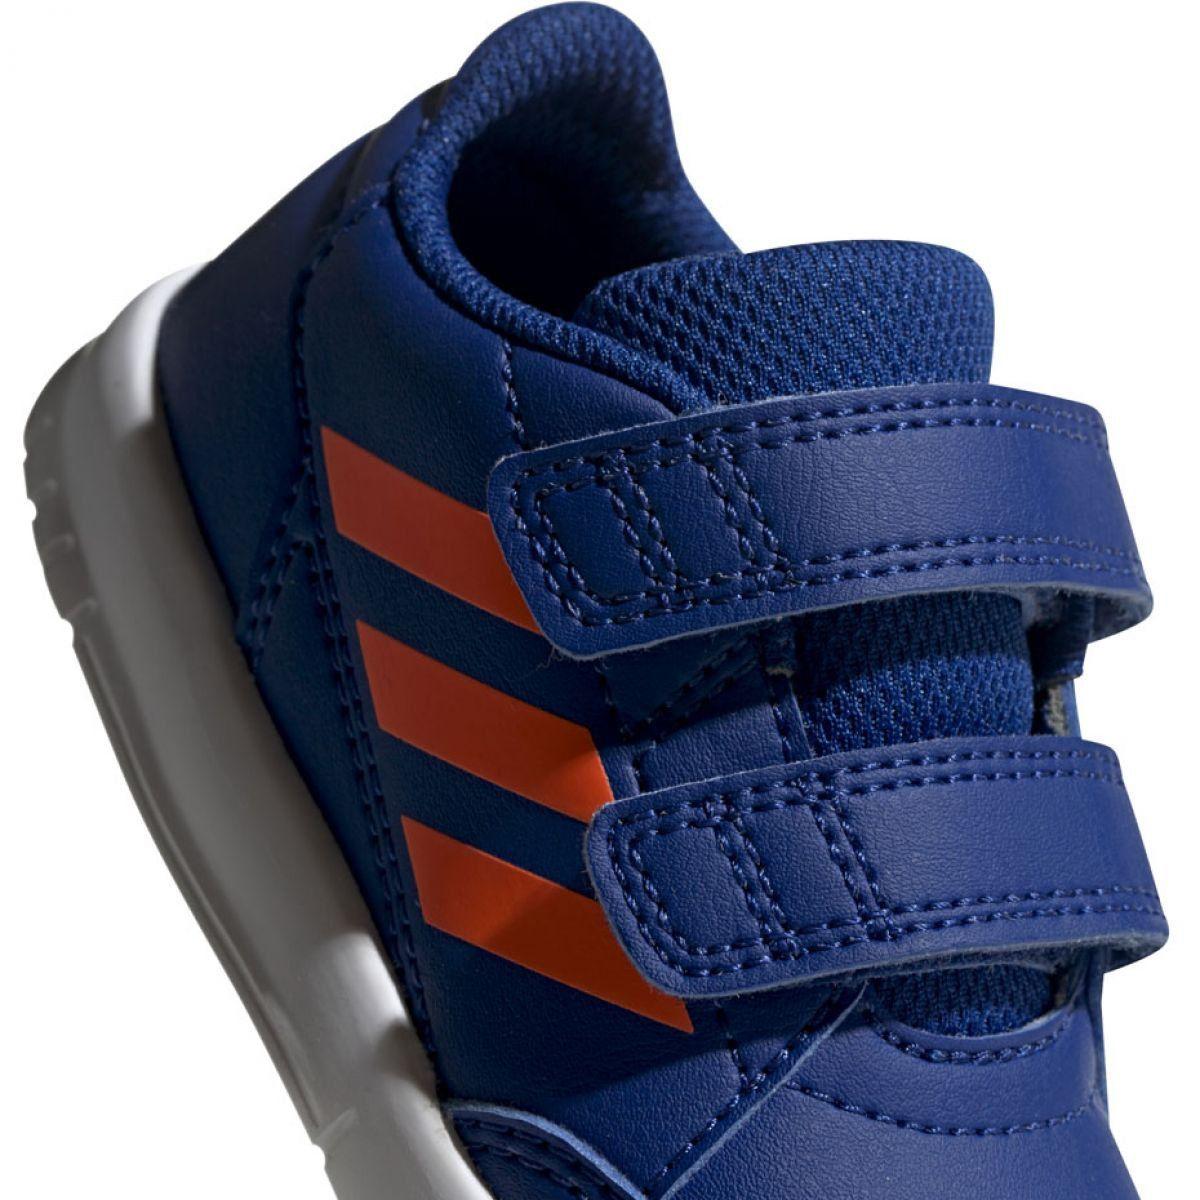 Buty Adidas Altasport Cf I Jr G27108 Niebieskie Sports Shoes Adidas Blue Shoes Kid Shoes